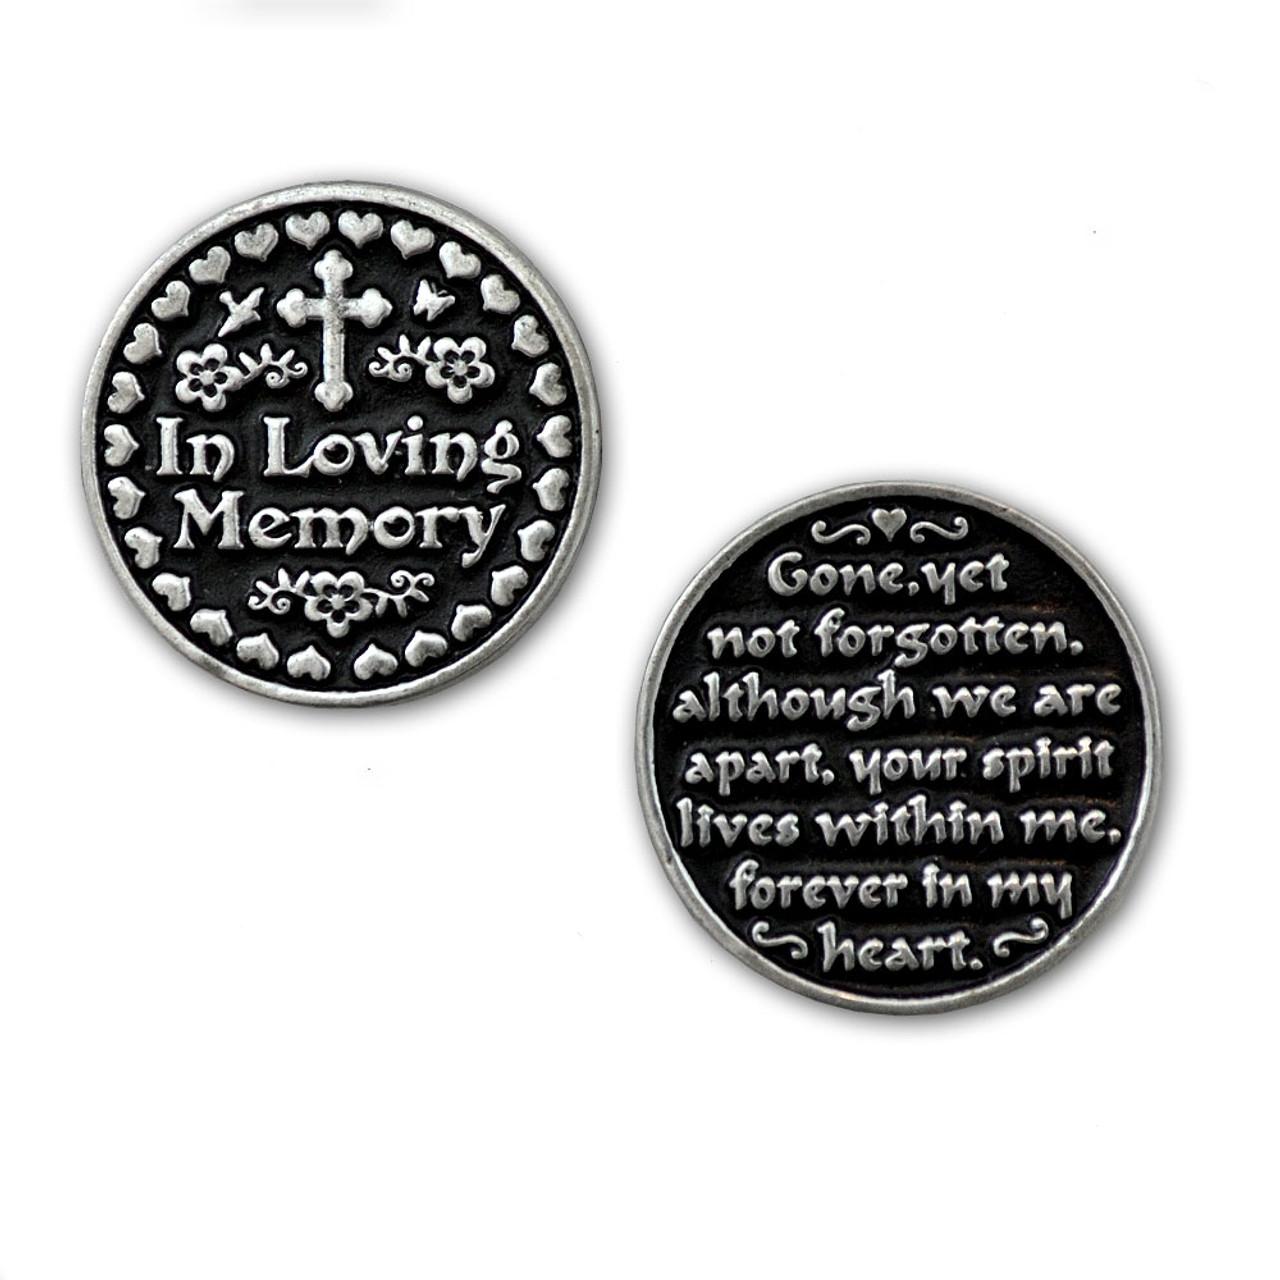 In Loving Memory Pocket Token